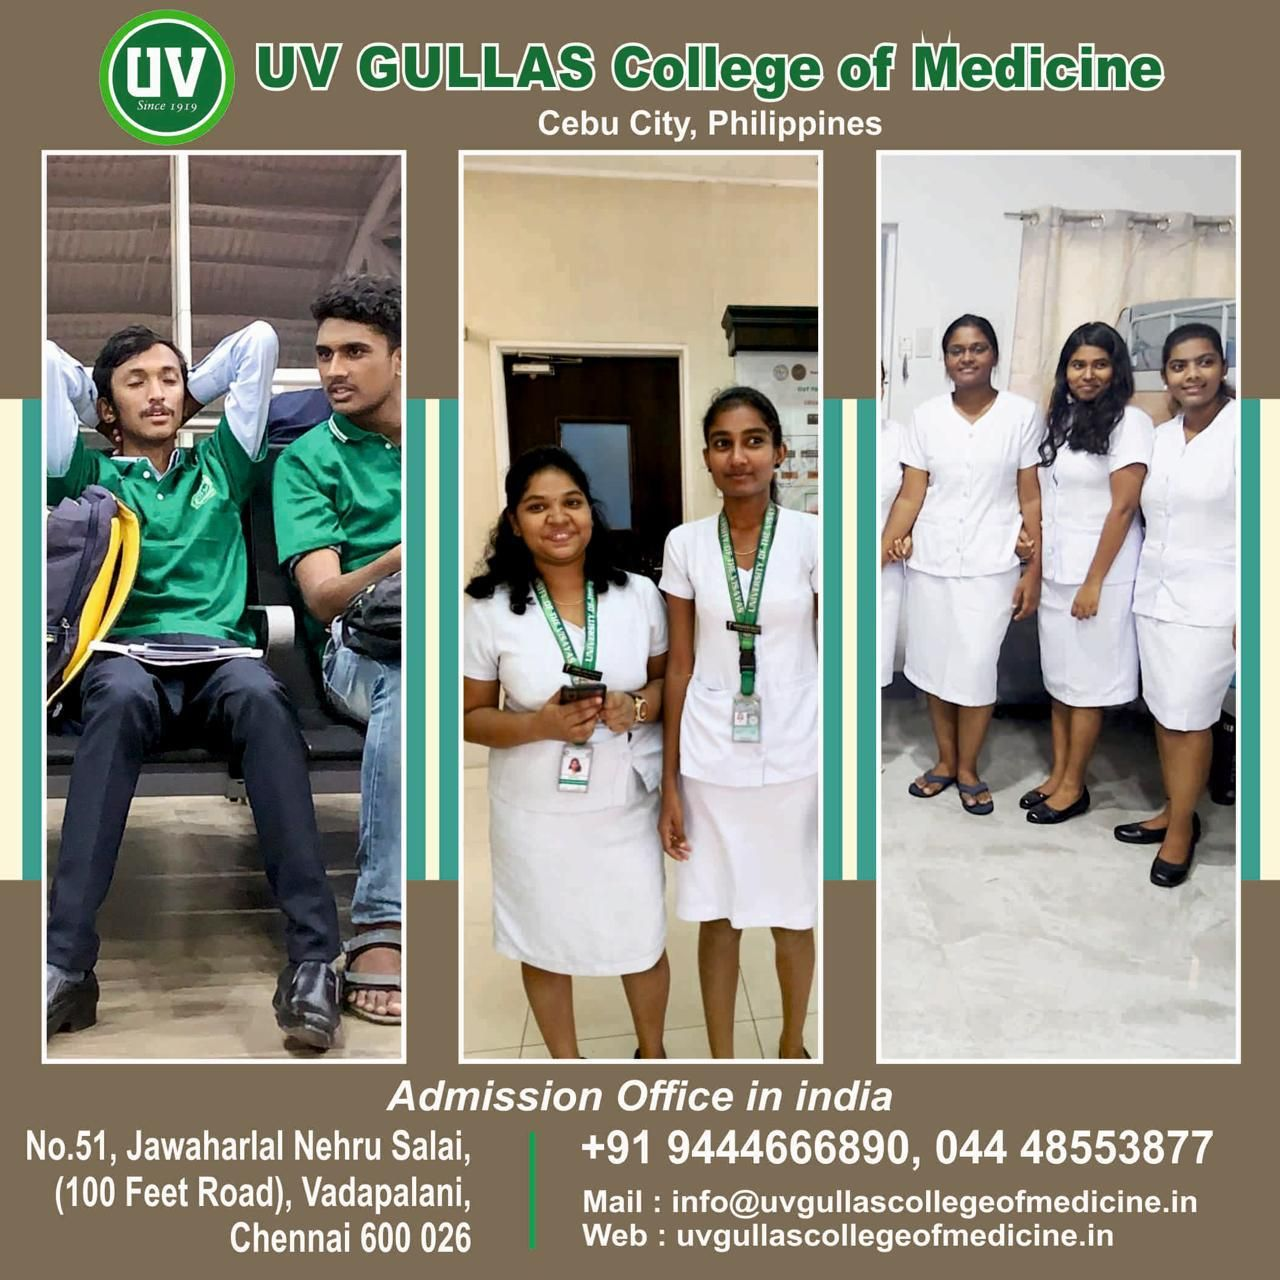 UV Gullas College of Medicine in Philippines in 2020